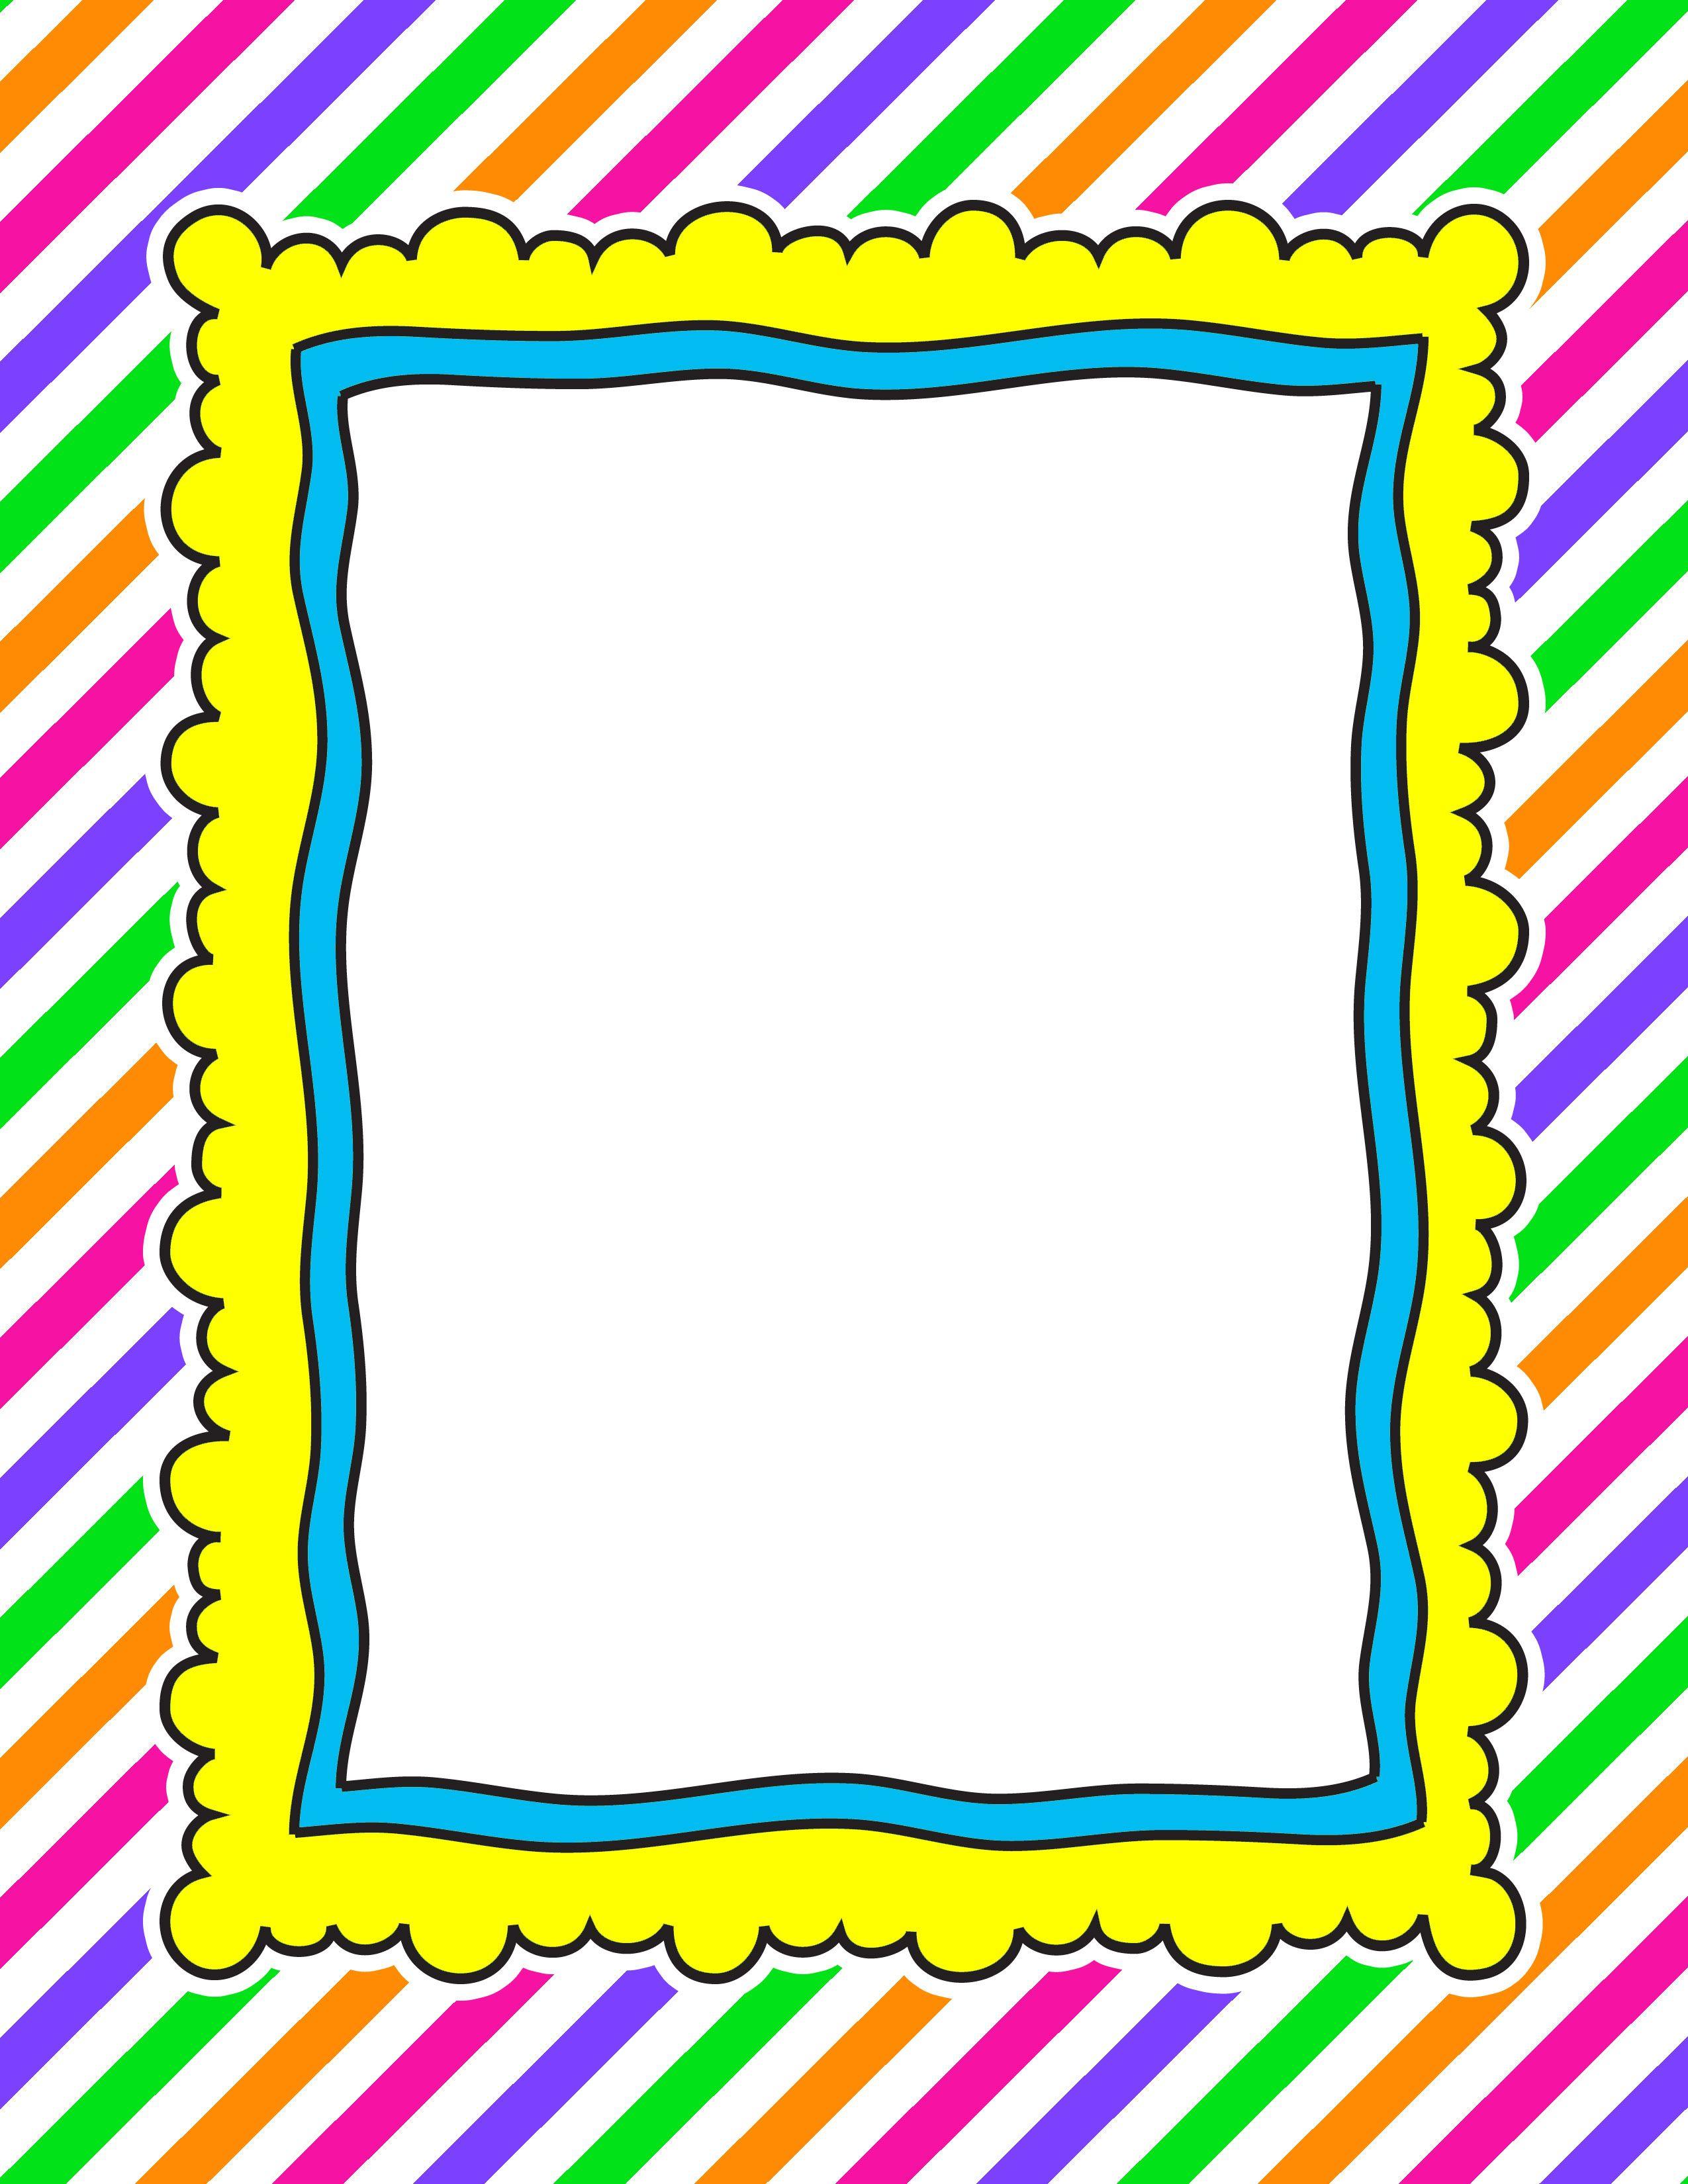 ✿**✿*FRAME*✿**✿* | cover | Pinterest | Marcos, Etiquetas y Escuela